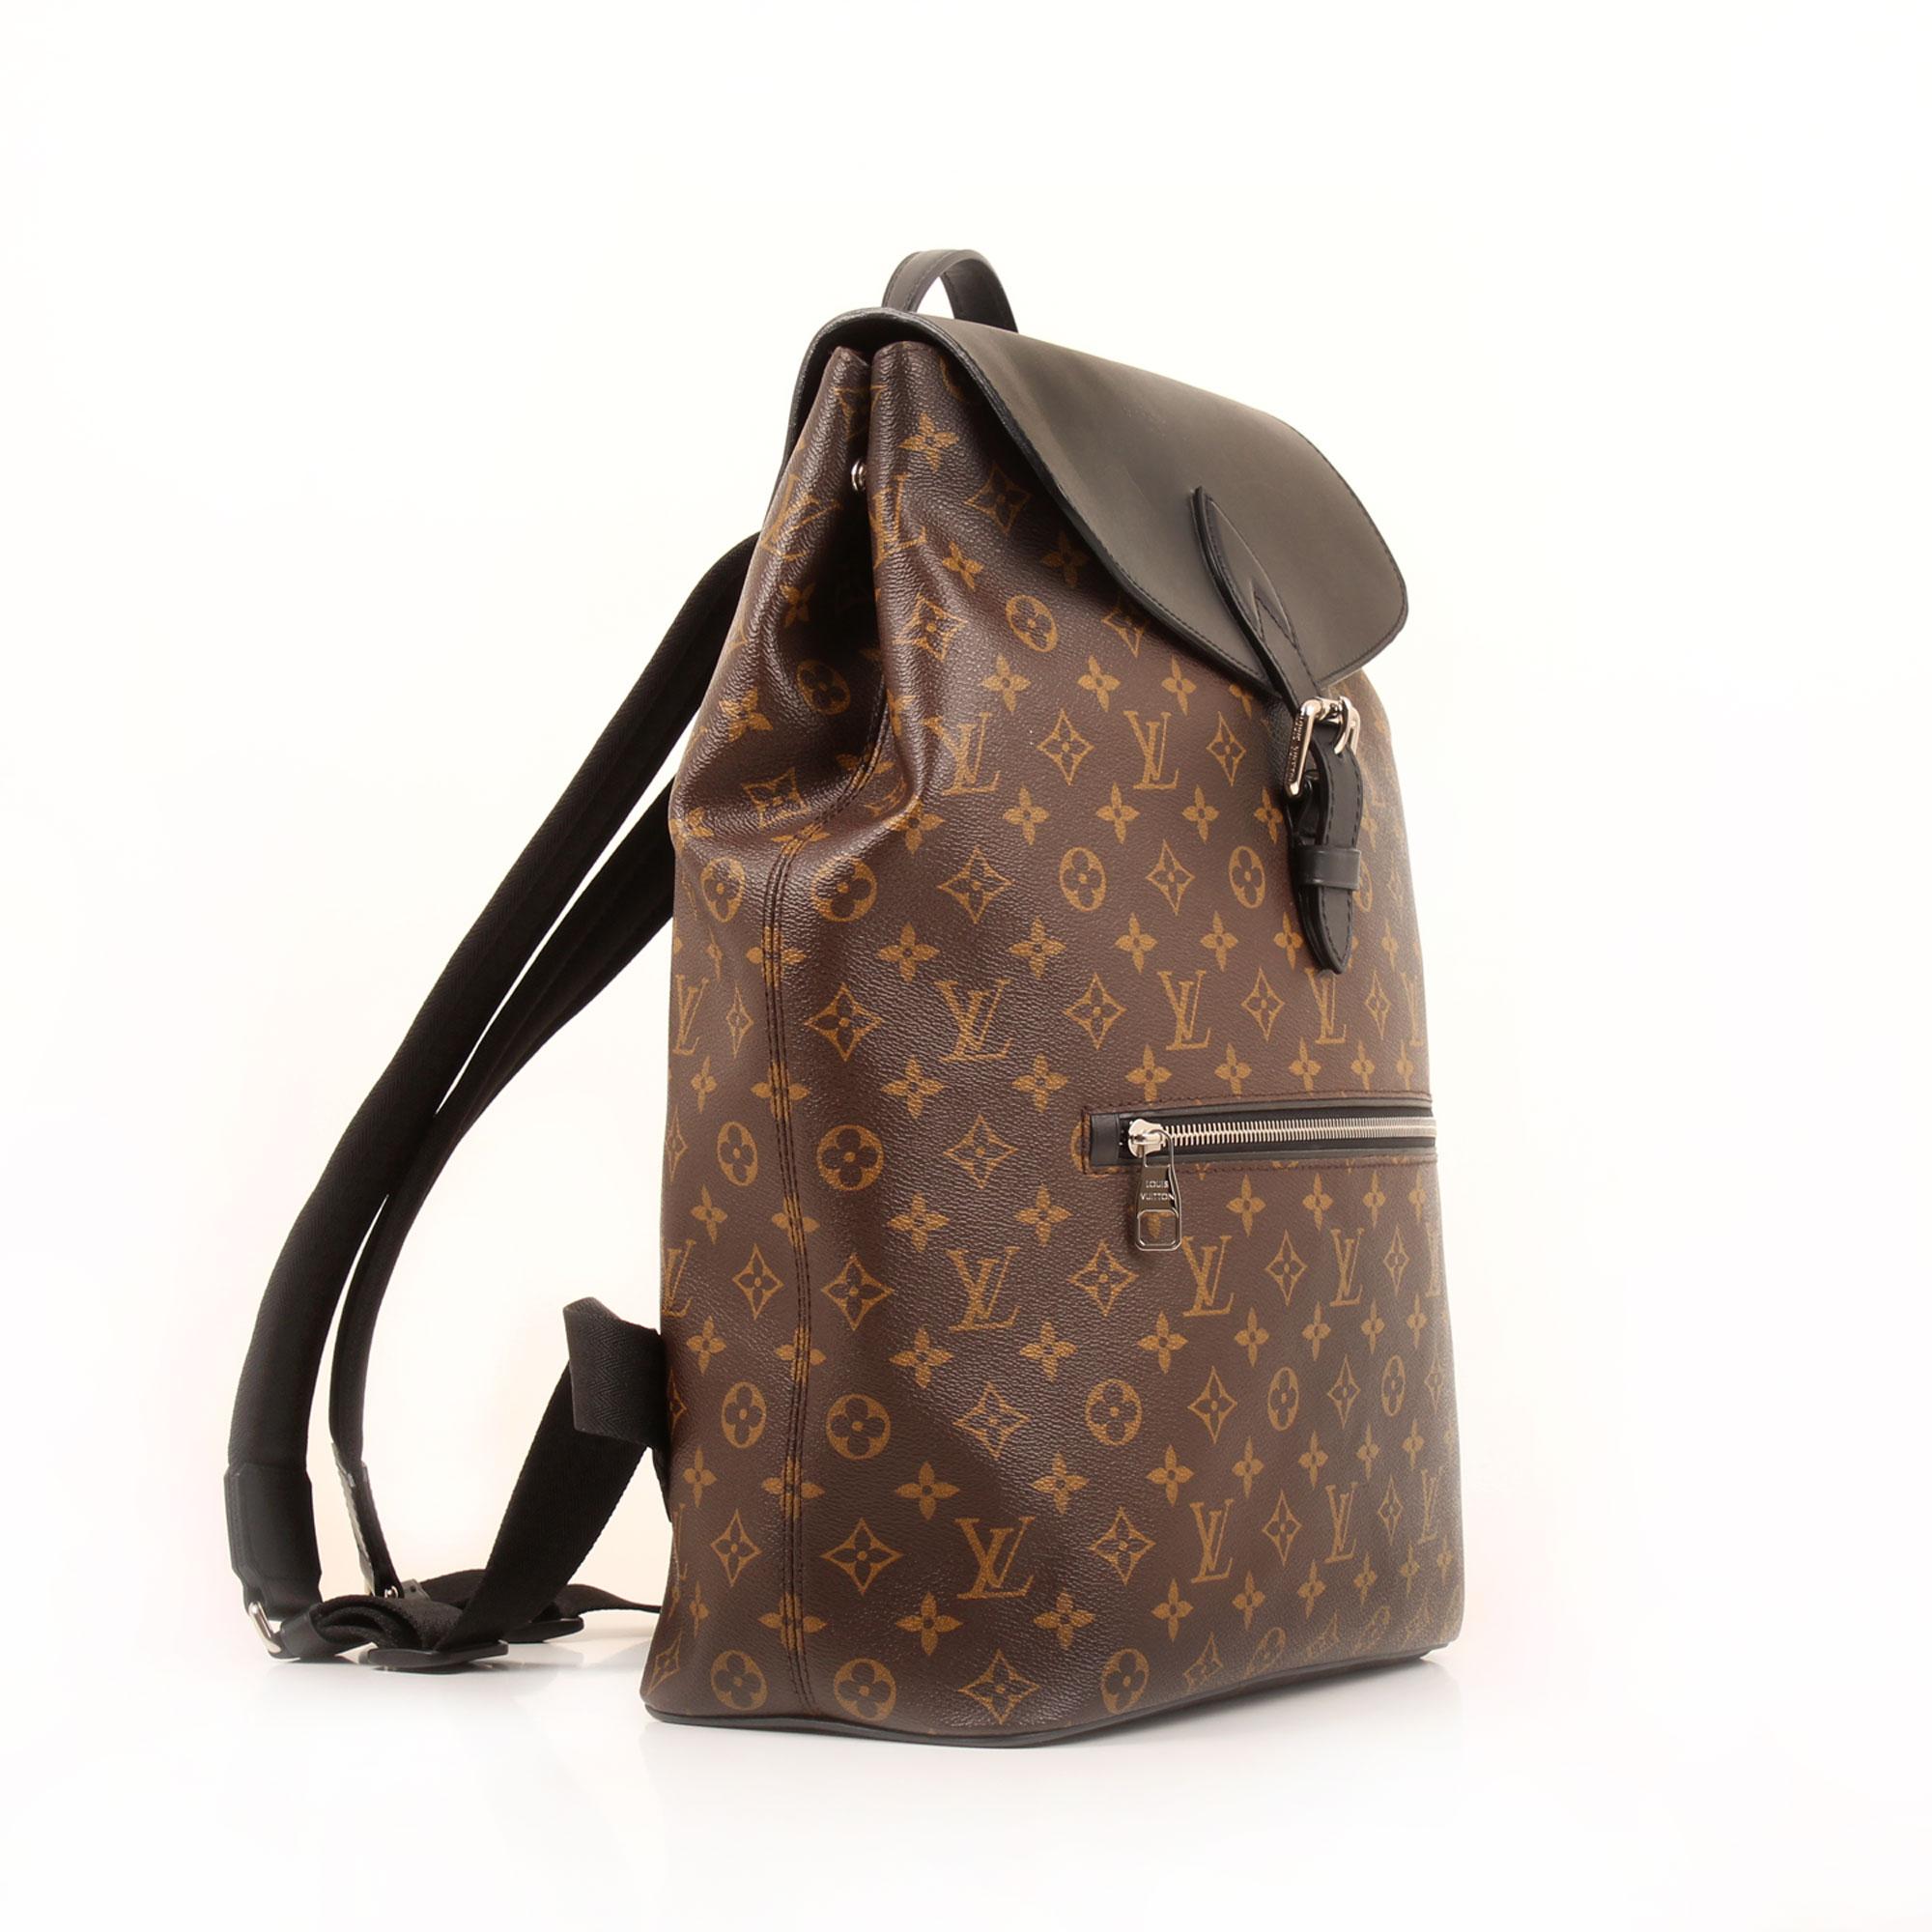 Side image of louis vuitton palk monogram macassar backpack